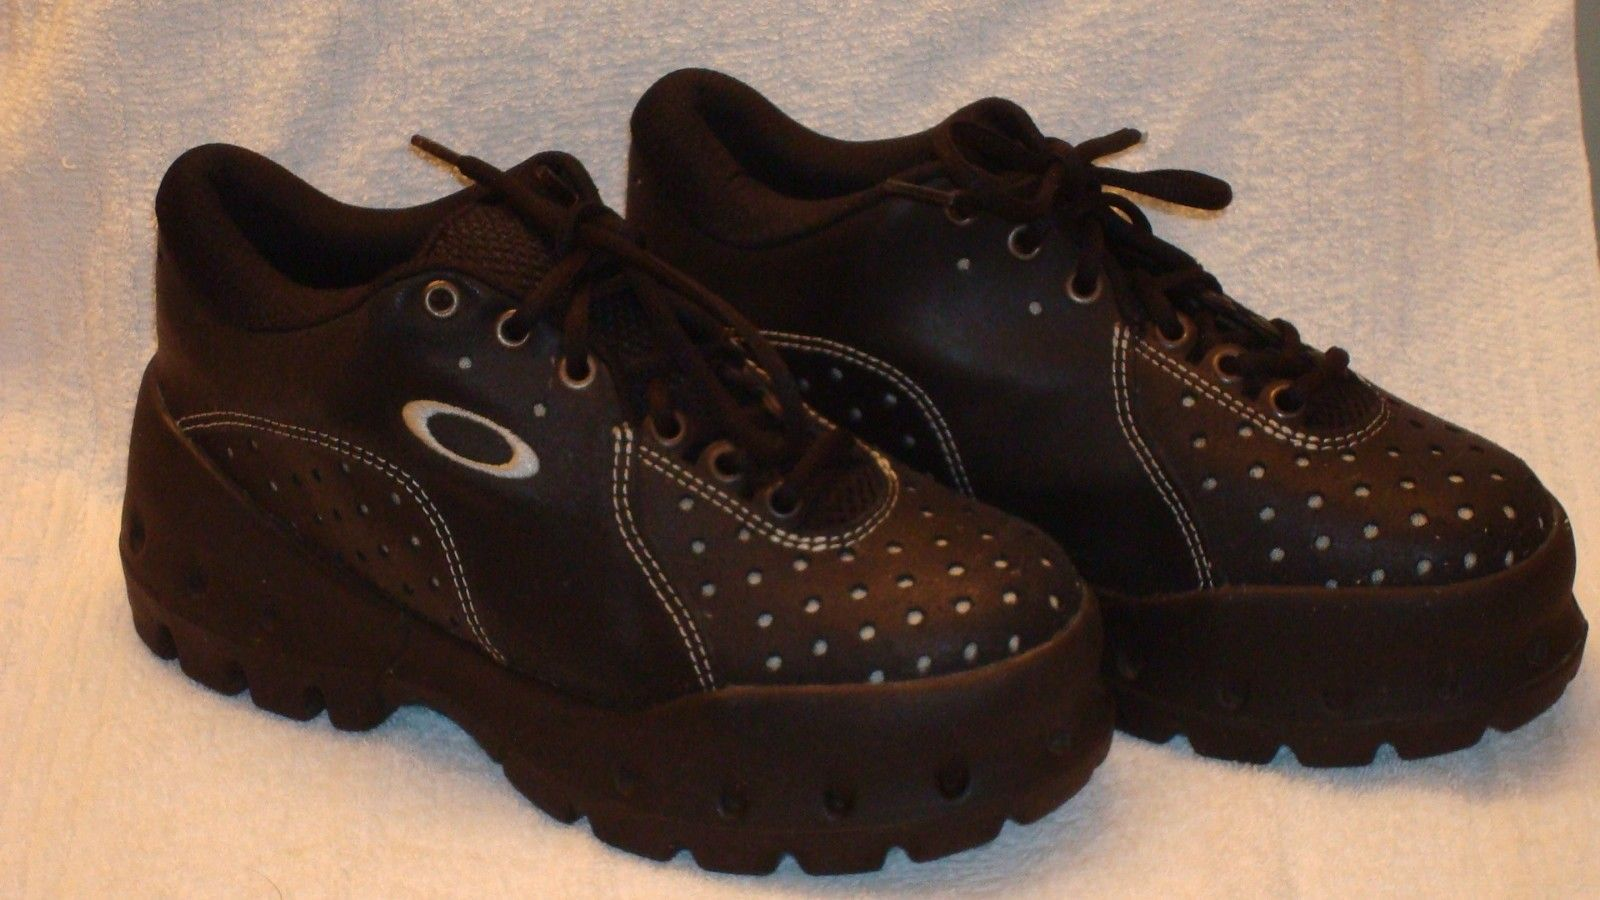 For Sale - Pit Shoe Black Mens Size 7.5 Womens Size 9 ...